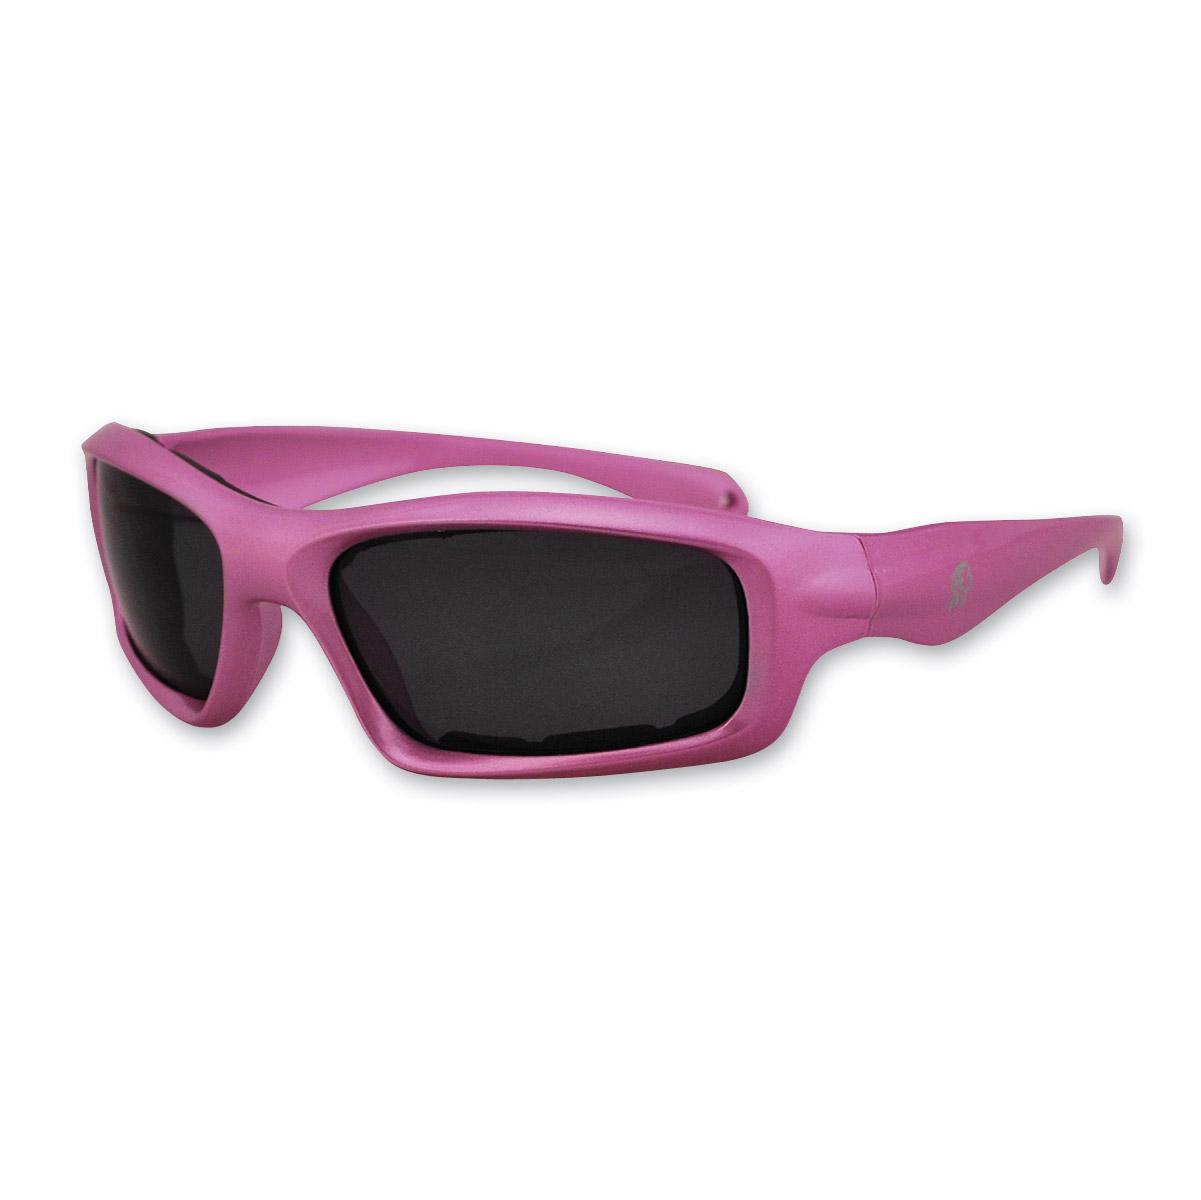 ZAN headgear Seattle Metallic Pink Sunglasses with Smoked Lenses